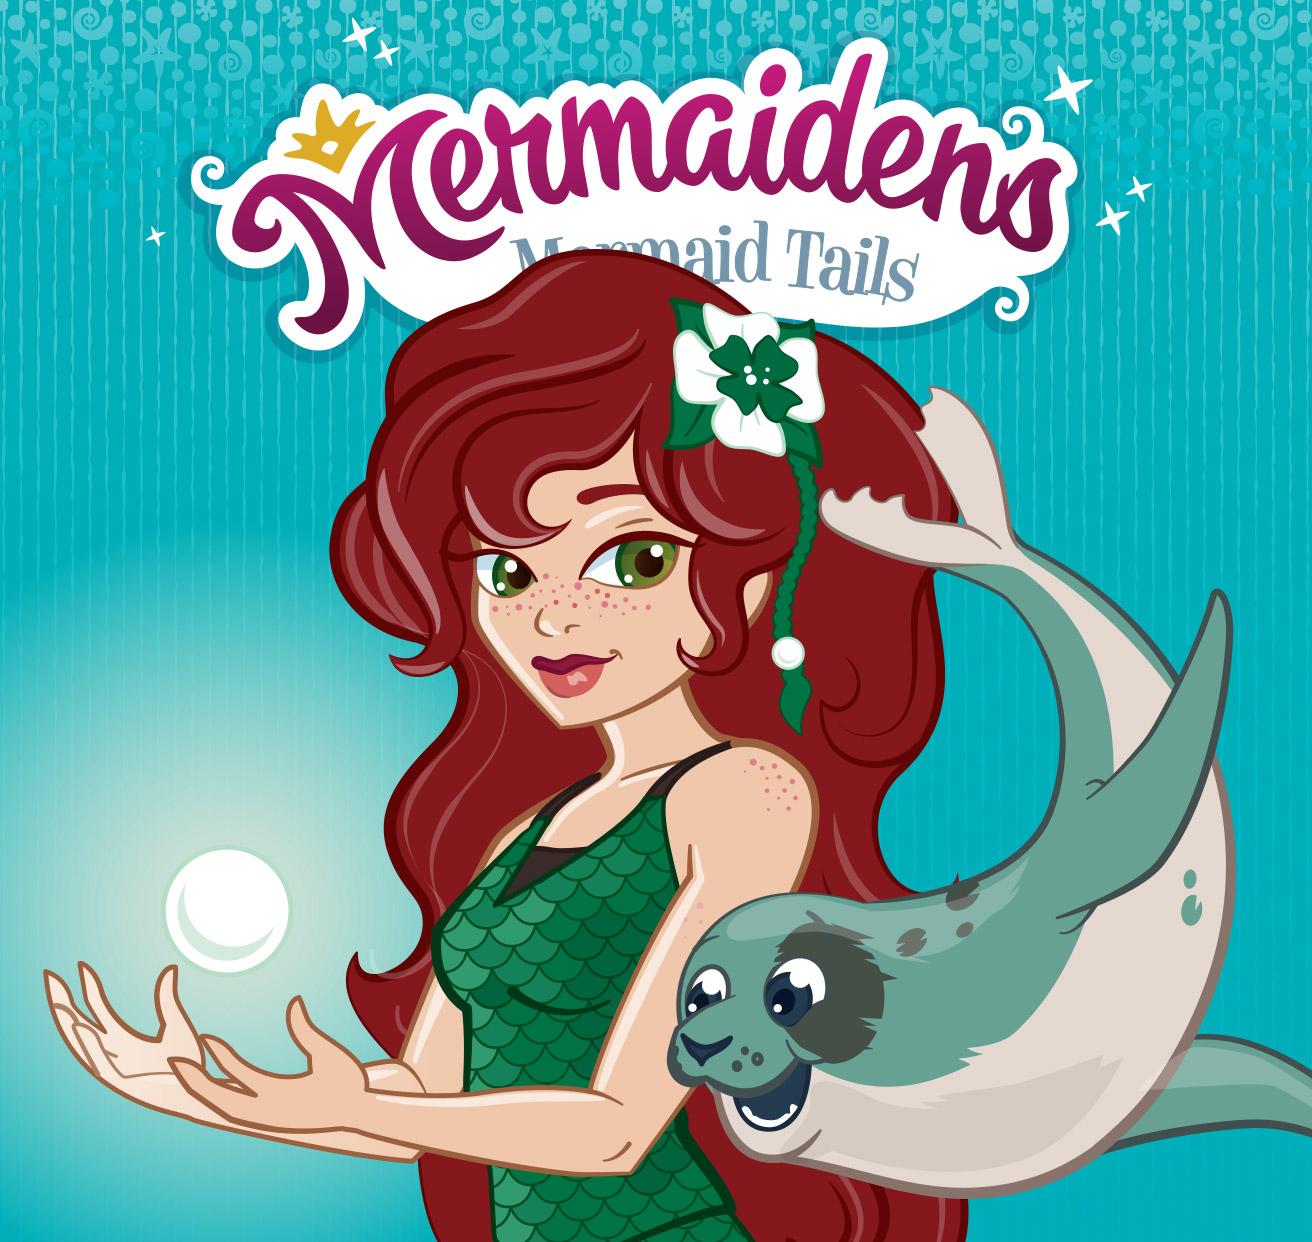 mermaiden-thumbnail-square.jpg